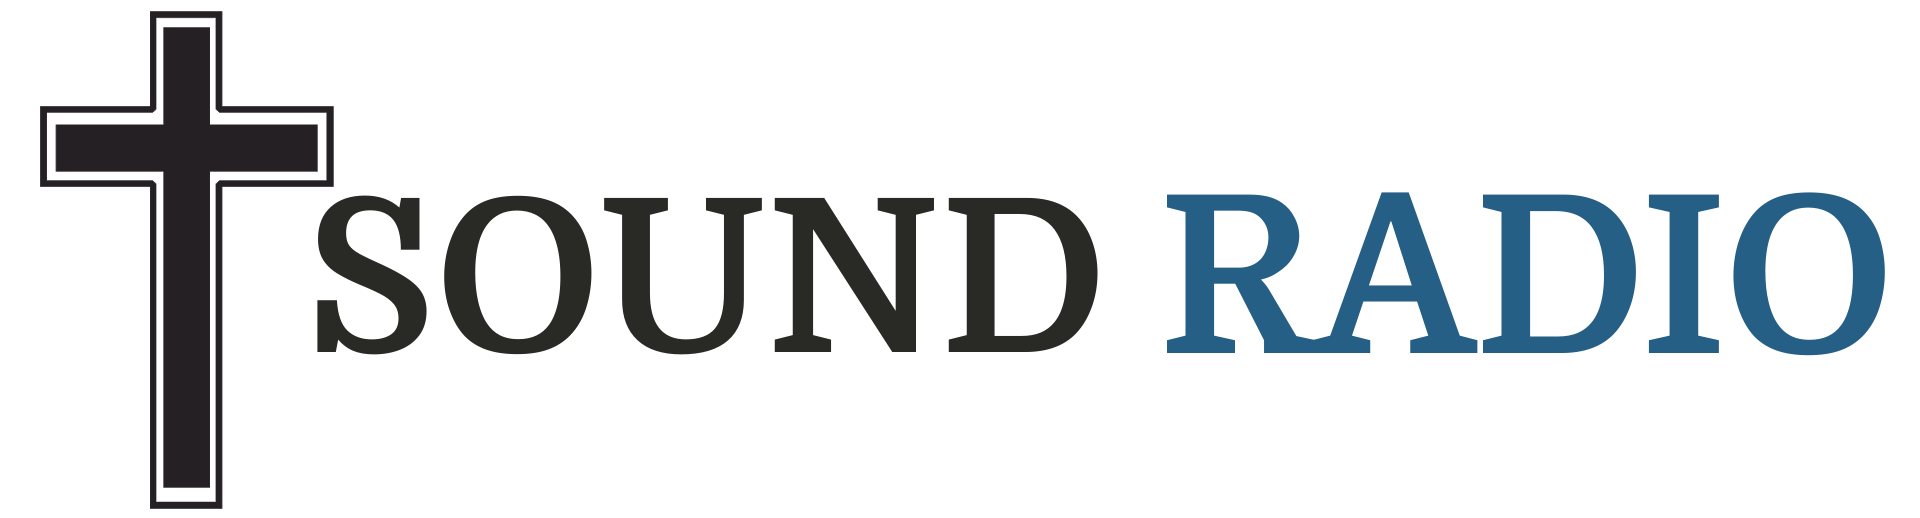 Today's Southern Gospel - Sound Radio